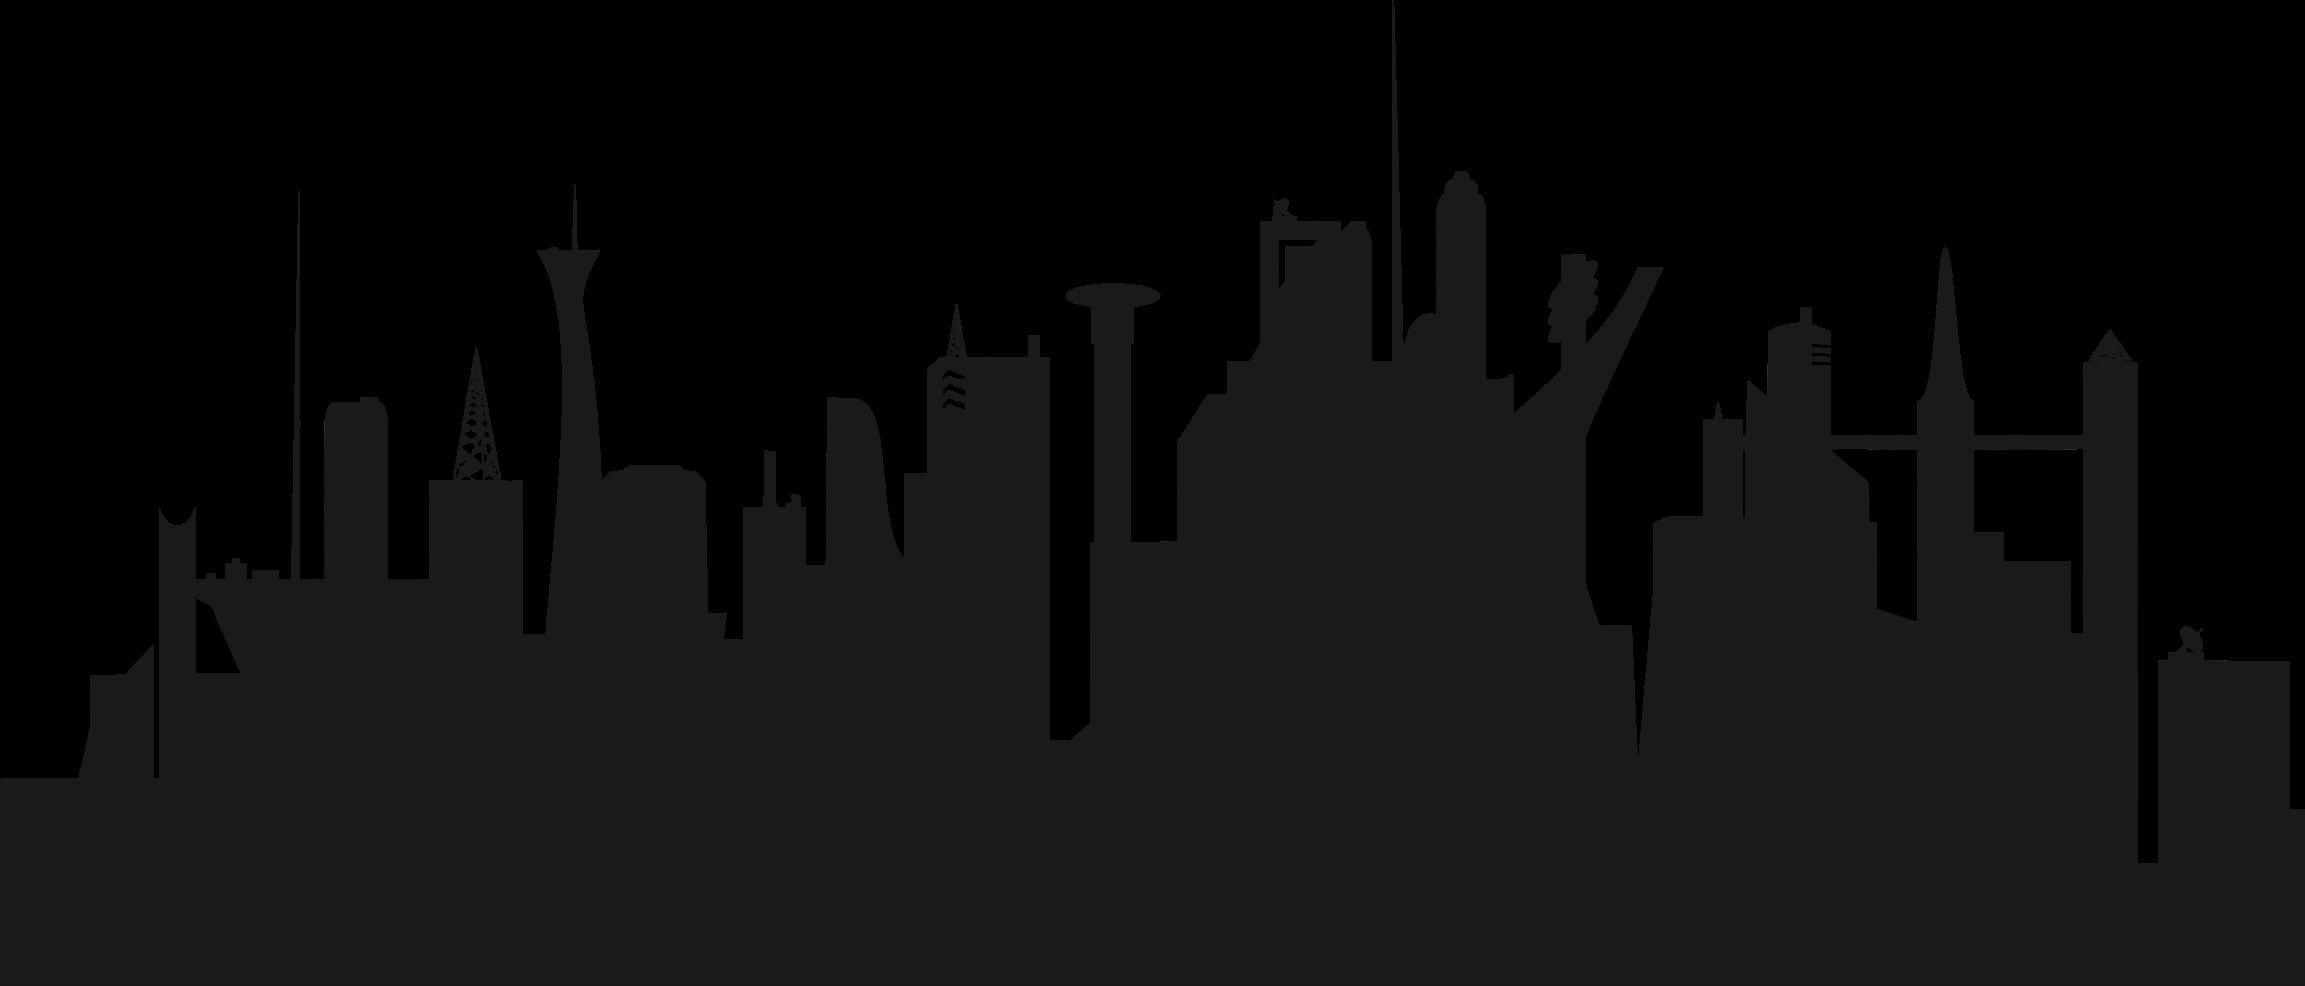 Clipart futurist black and white stock Futuristic cityscape clipart images gallery for free download ... black and white stock